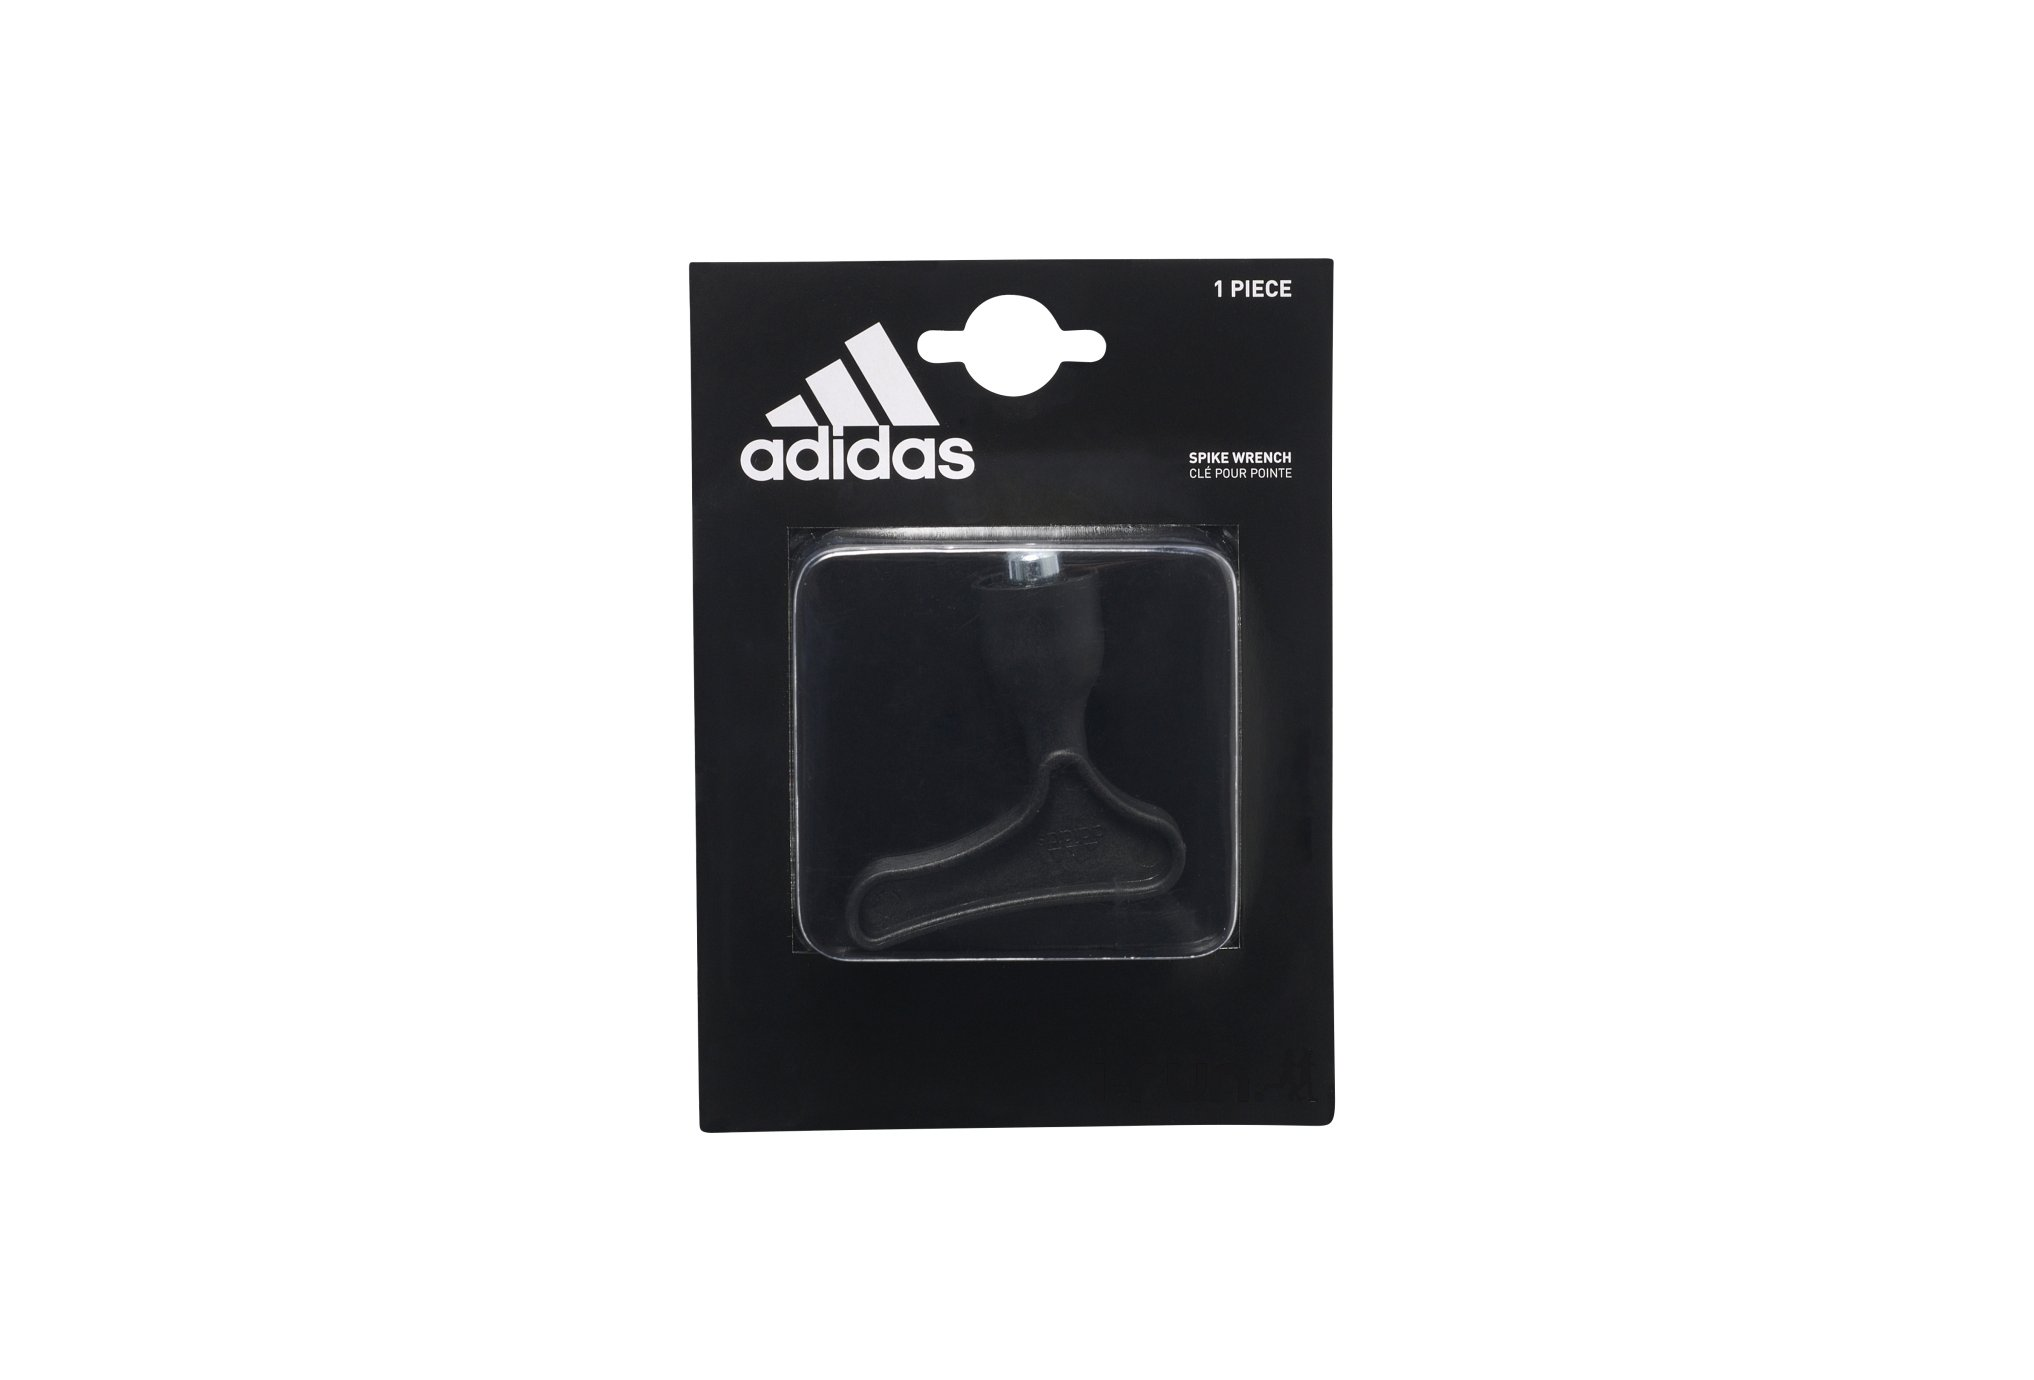 Adidas Clé de serrage spike wrench chaussures homme